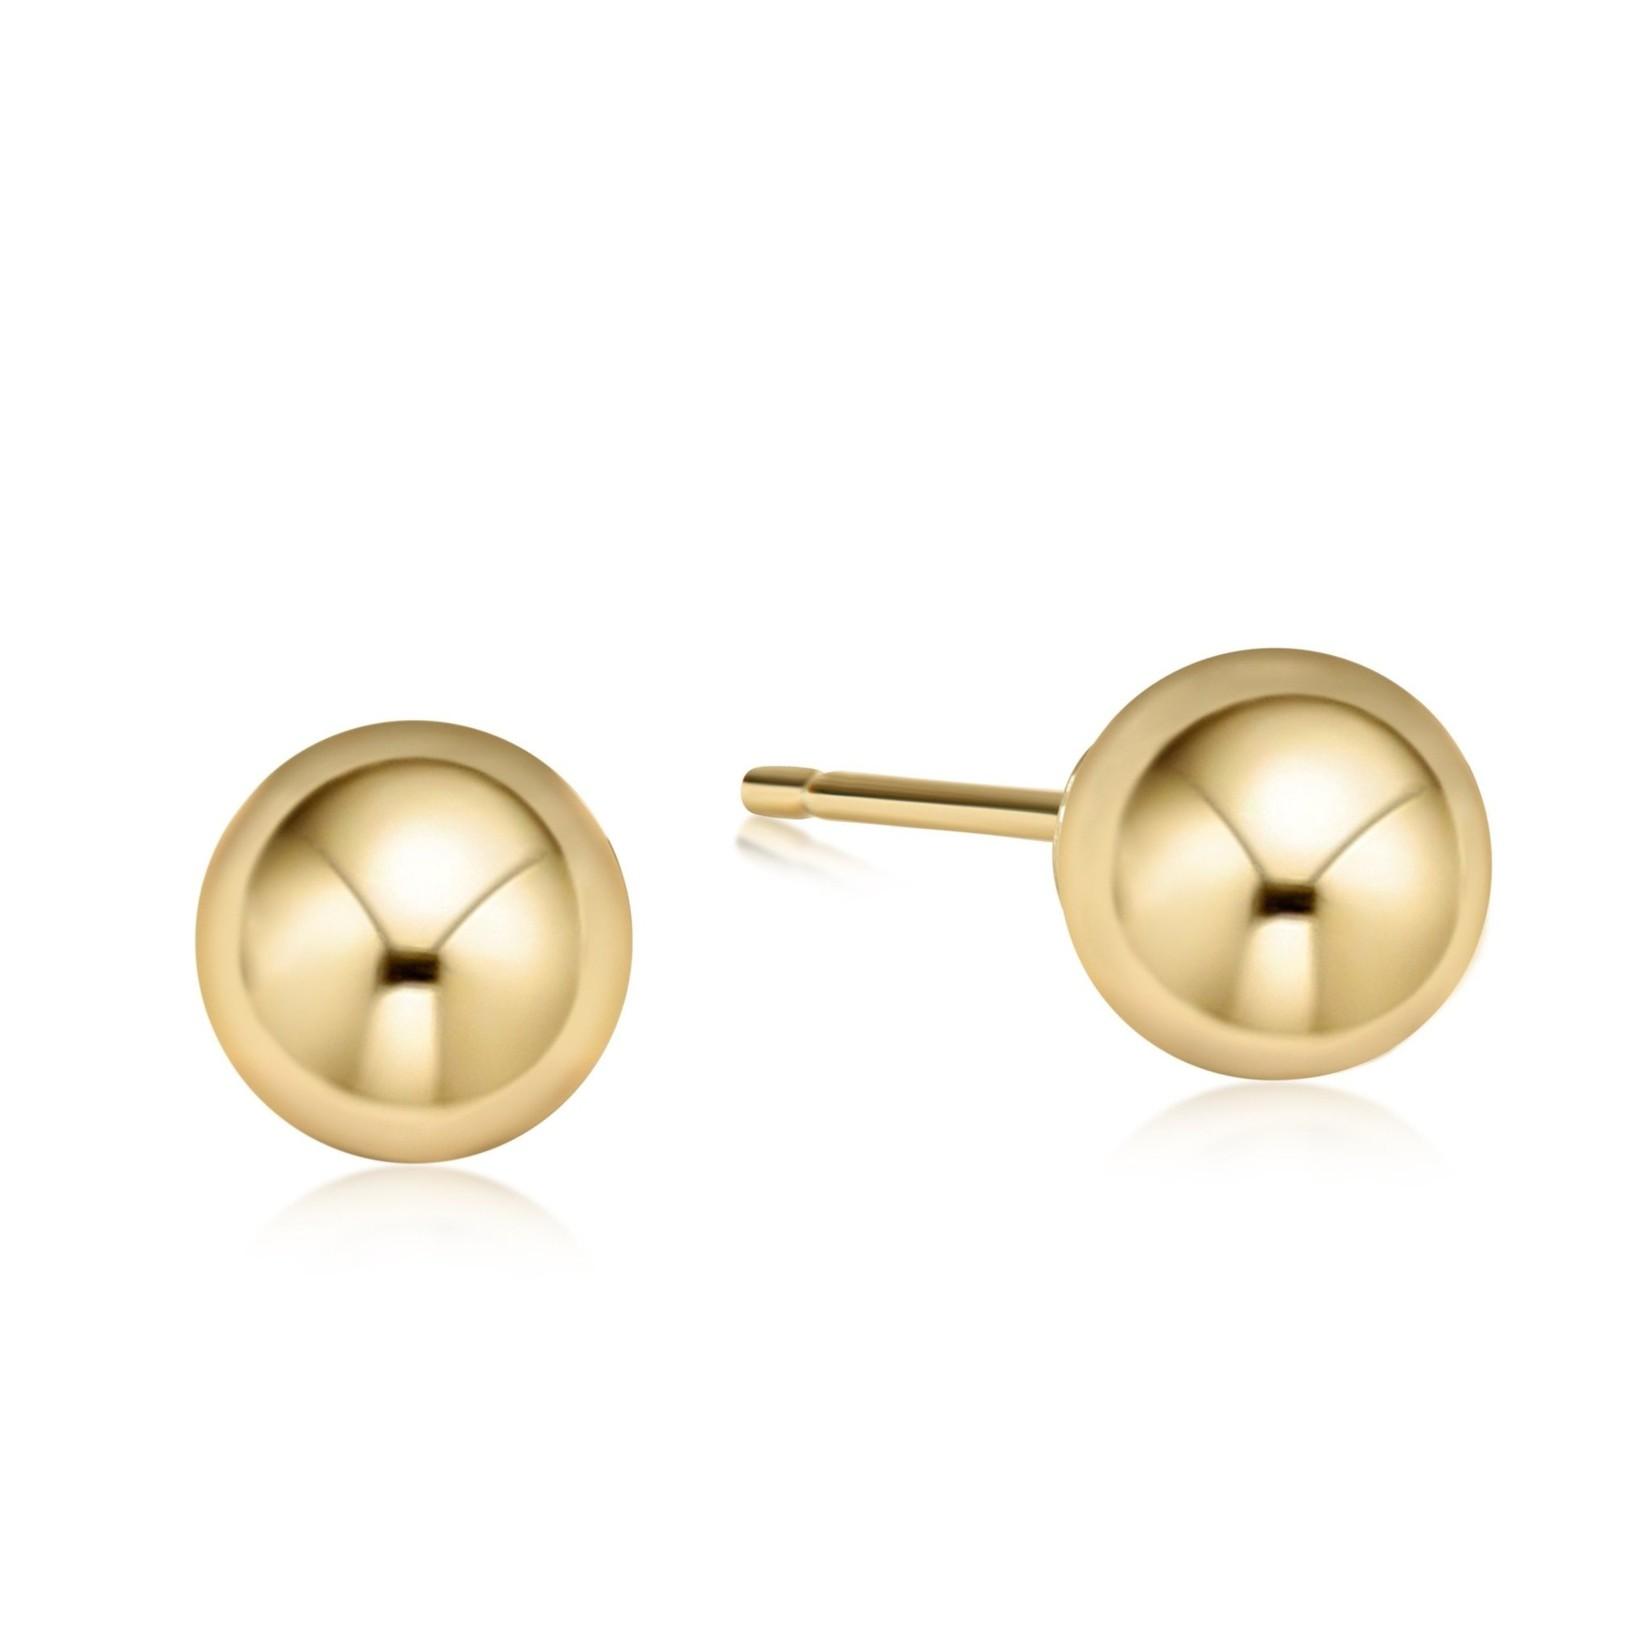 Enewton Design Classic 10mm Ball Stud Gold